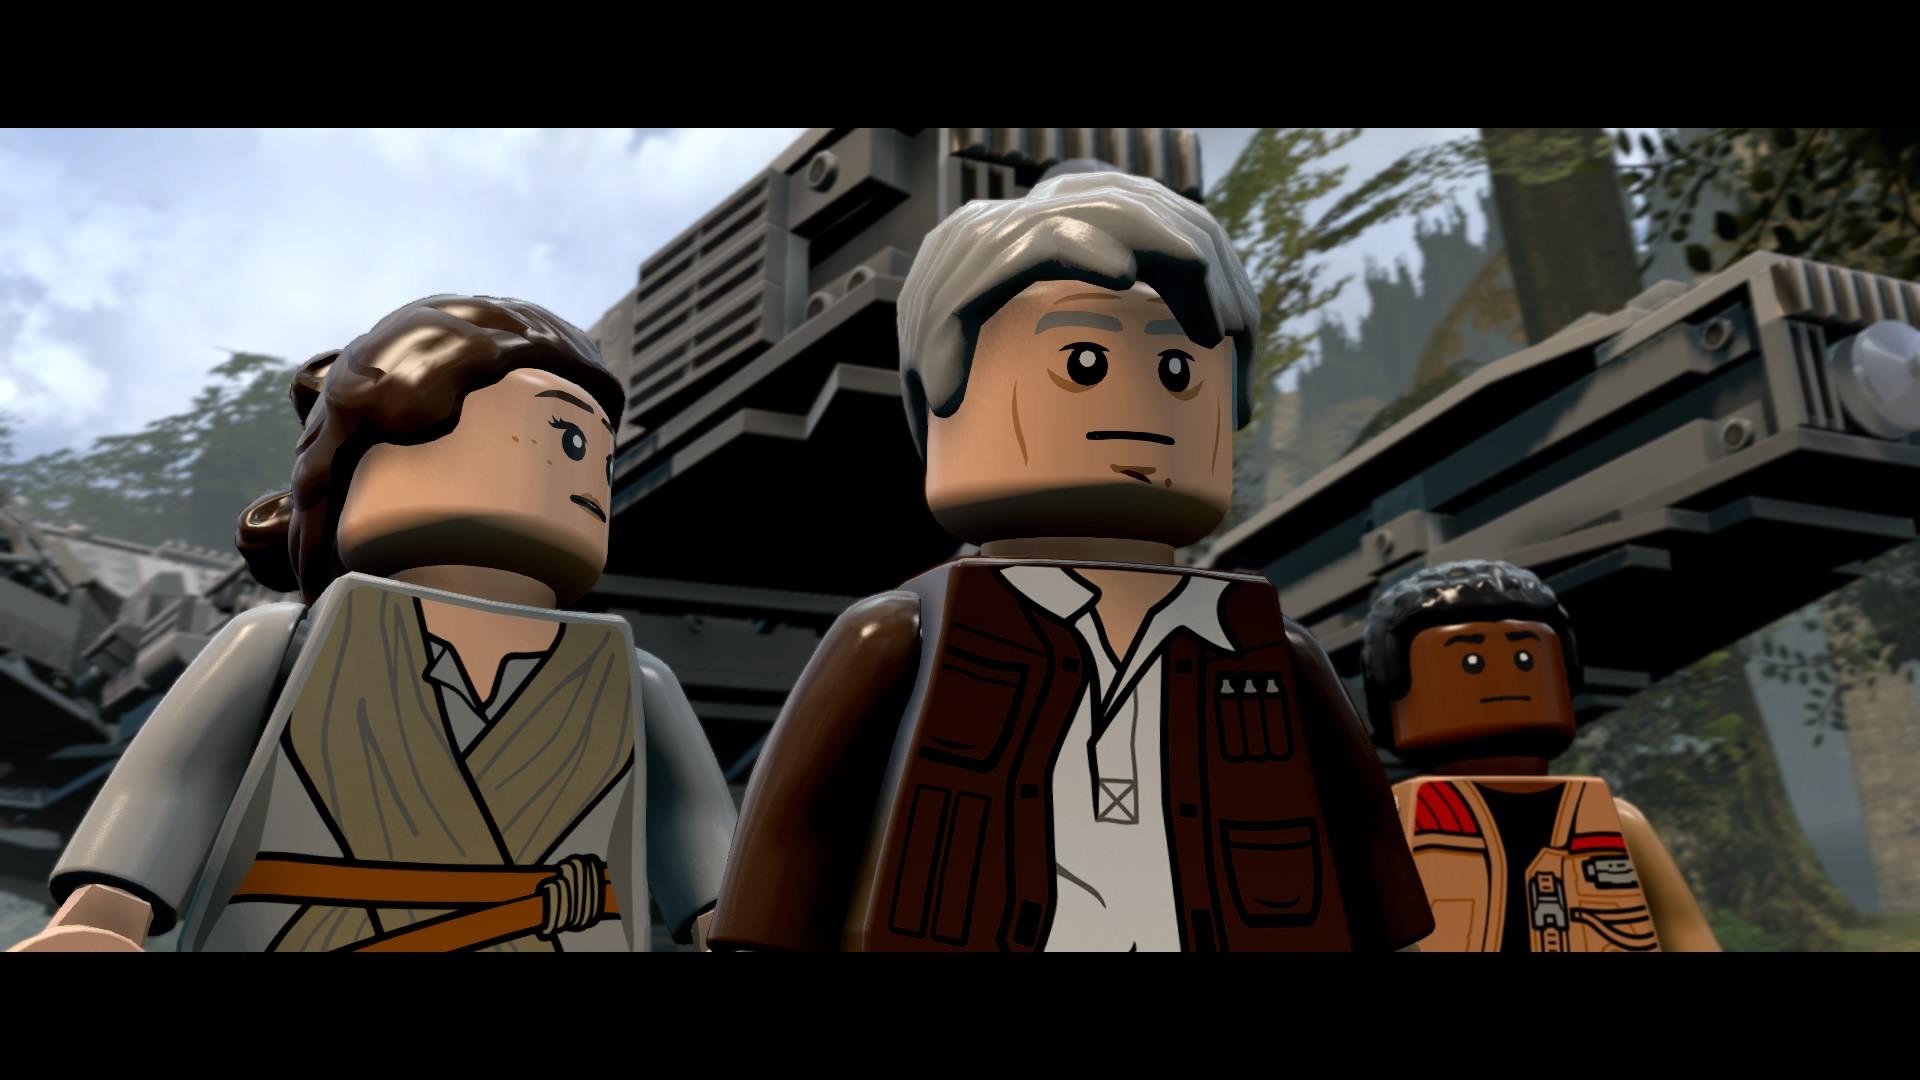 Video, Games, Lego, Star, Wars, Force, Awakens, StarWars, The Force Awakens, Gigamax, Review, Lego Star Wars